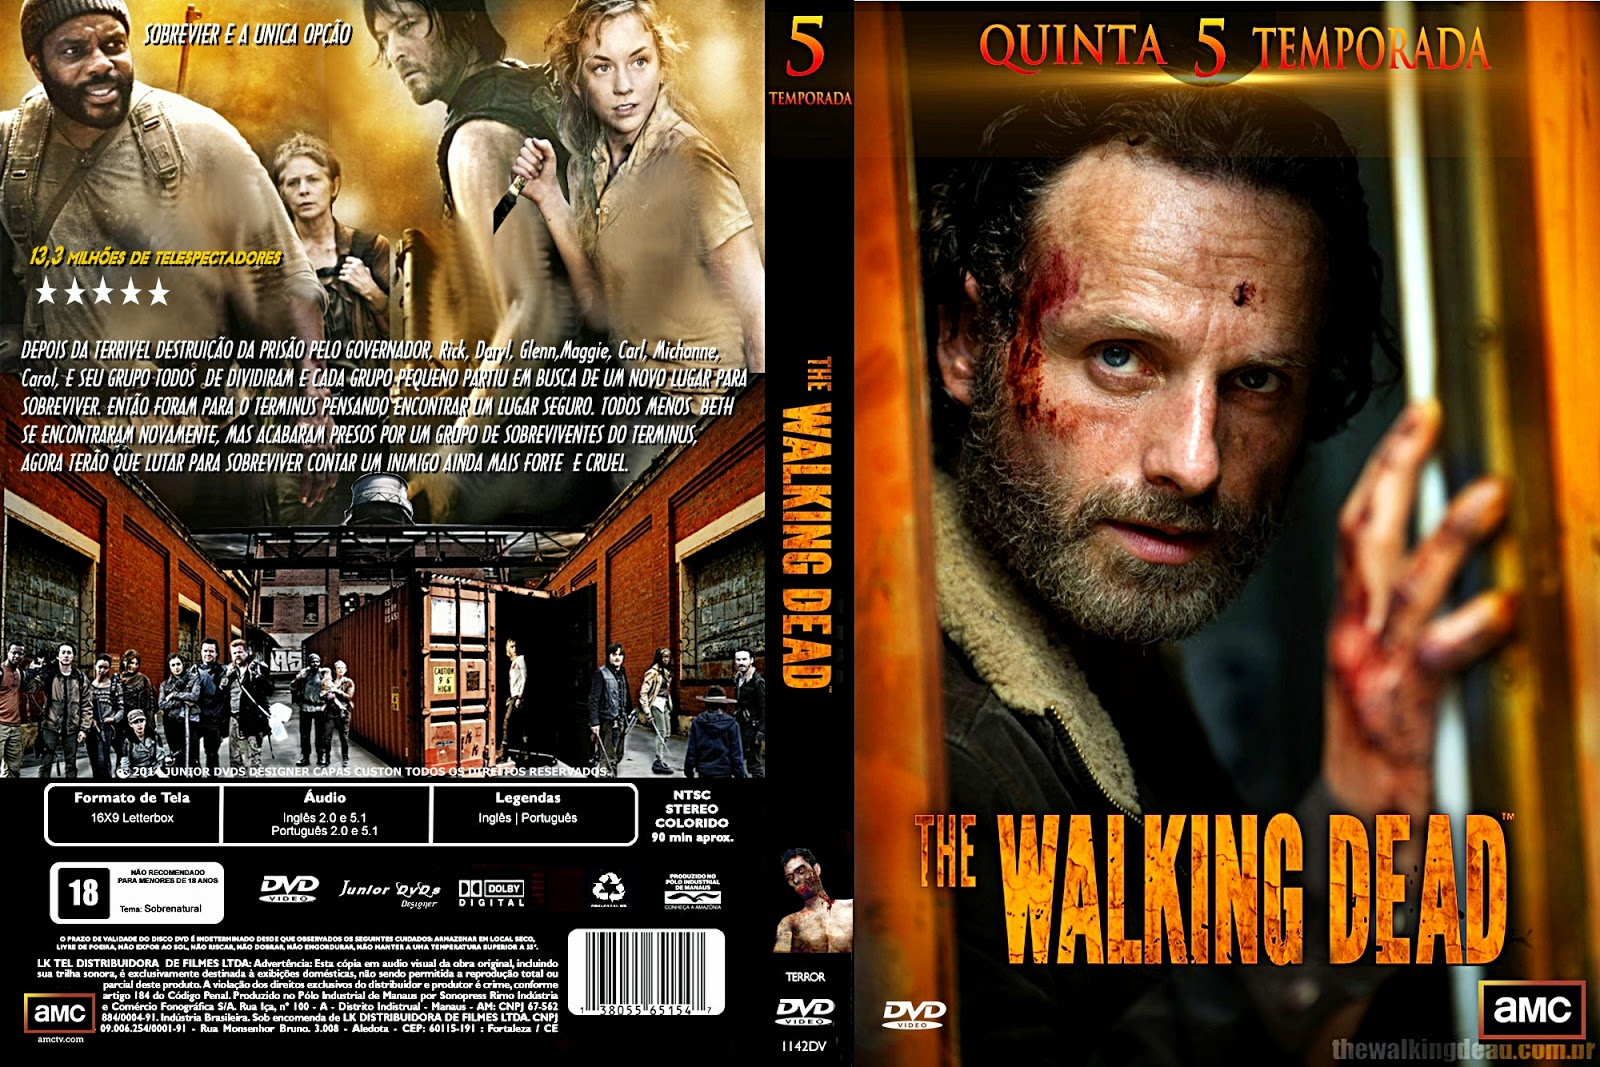 THE WALKING DEAD TEMPORADA 5 - ESPAÑOL LATINO (ONLINE + DESCARGA ...